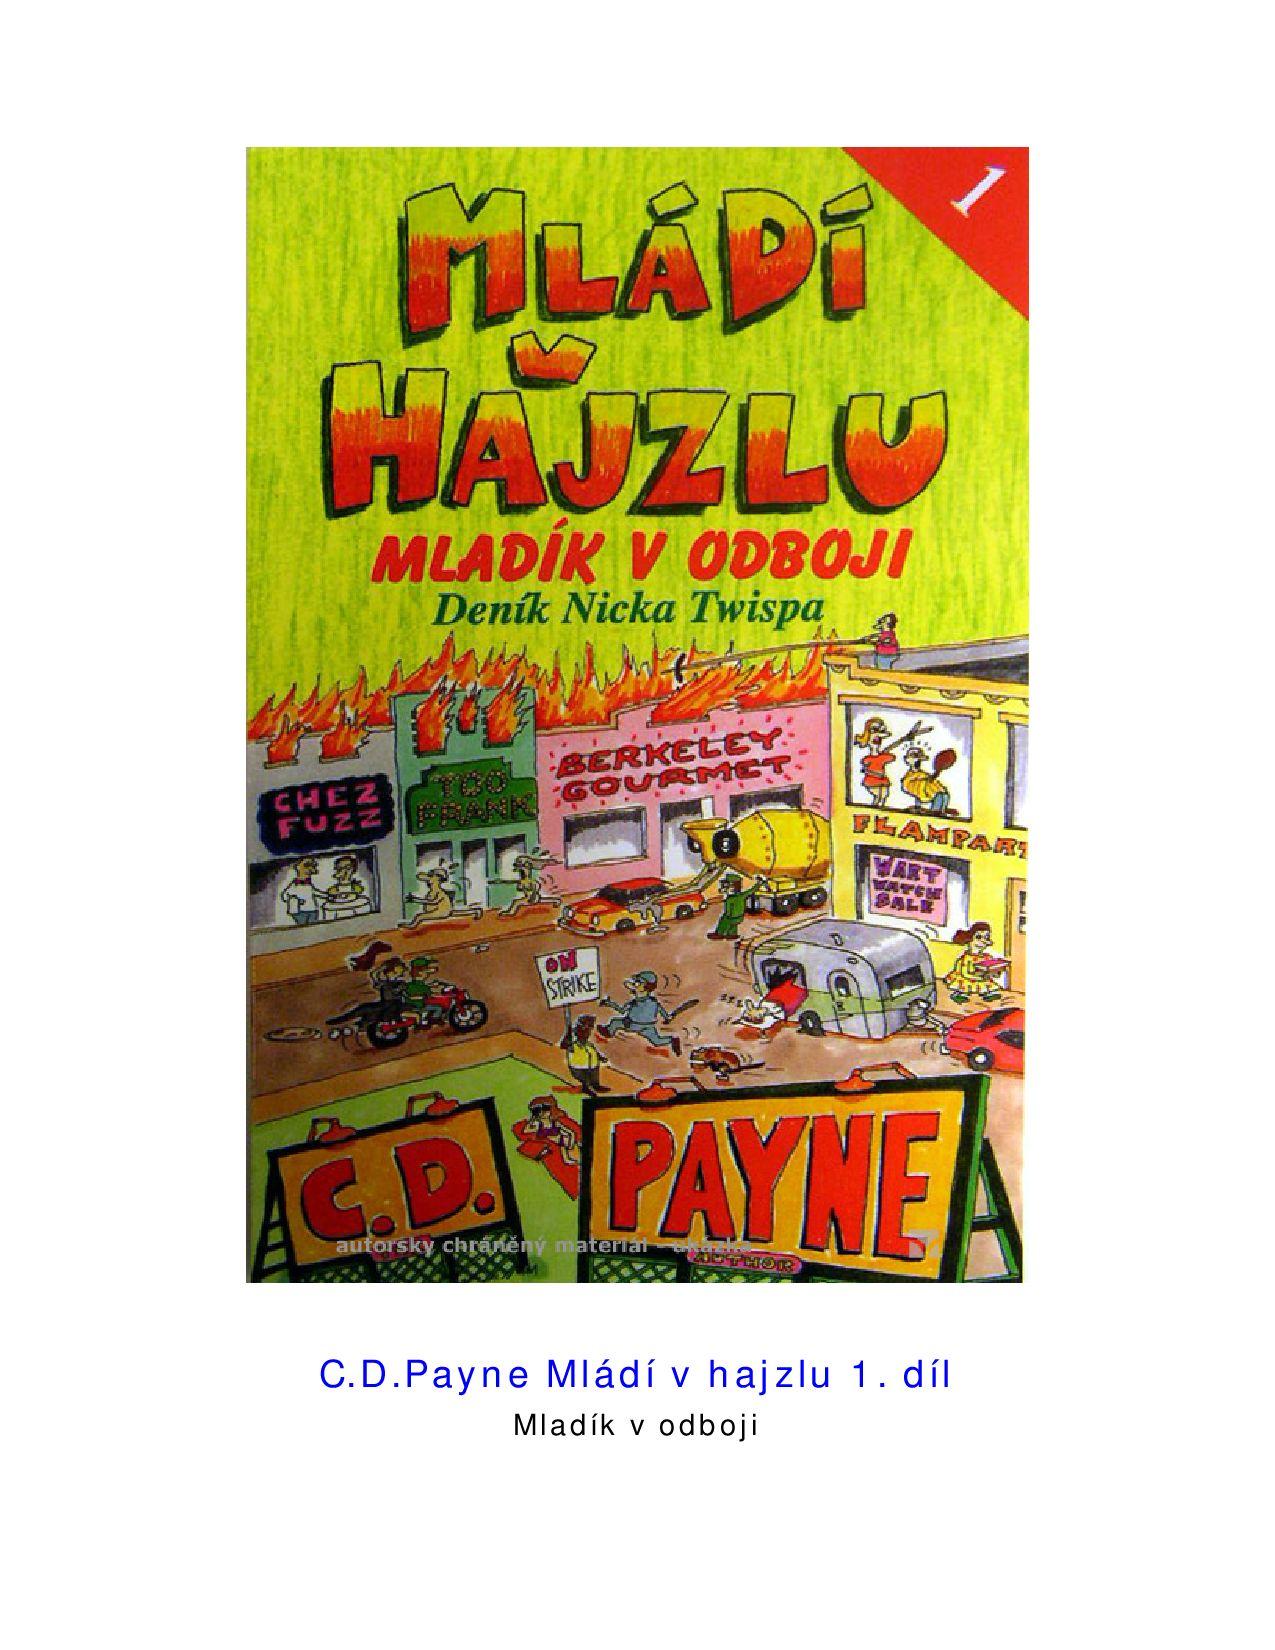 Mládí v hajzlu by Call Brak - issuu eeec4100f5